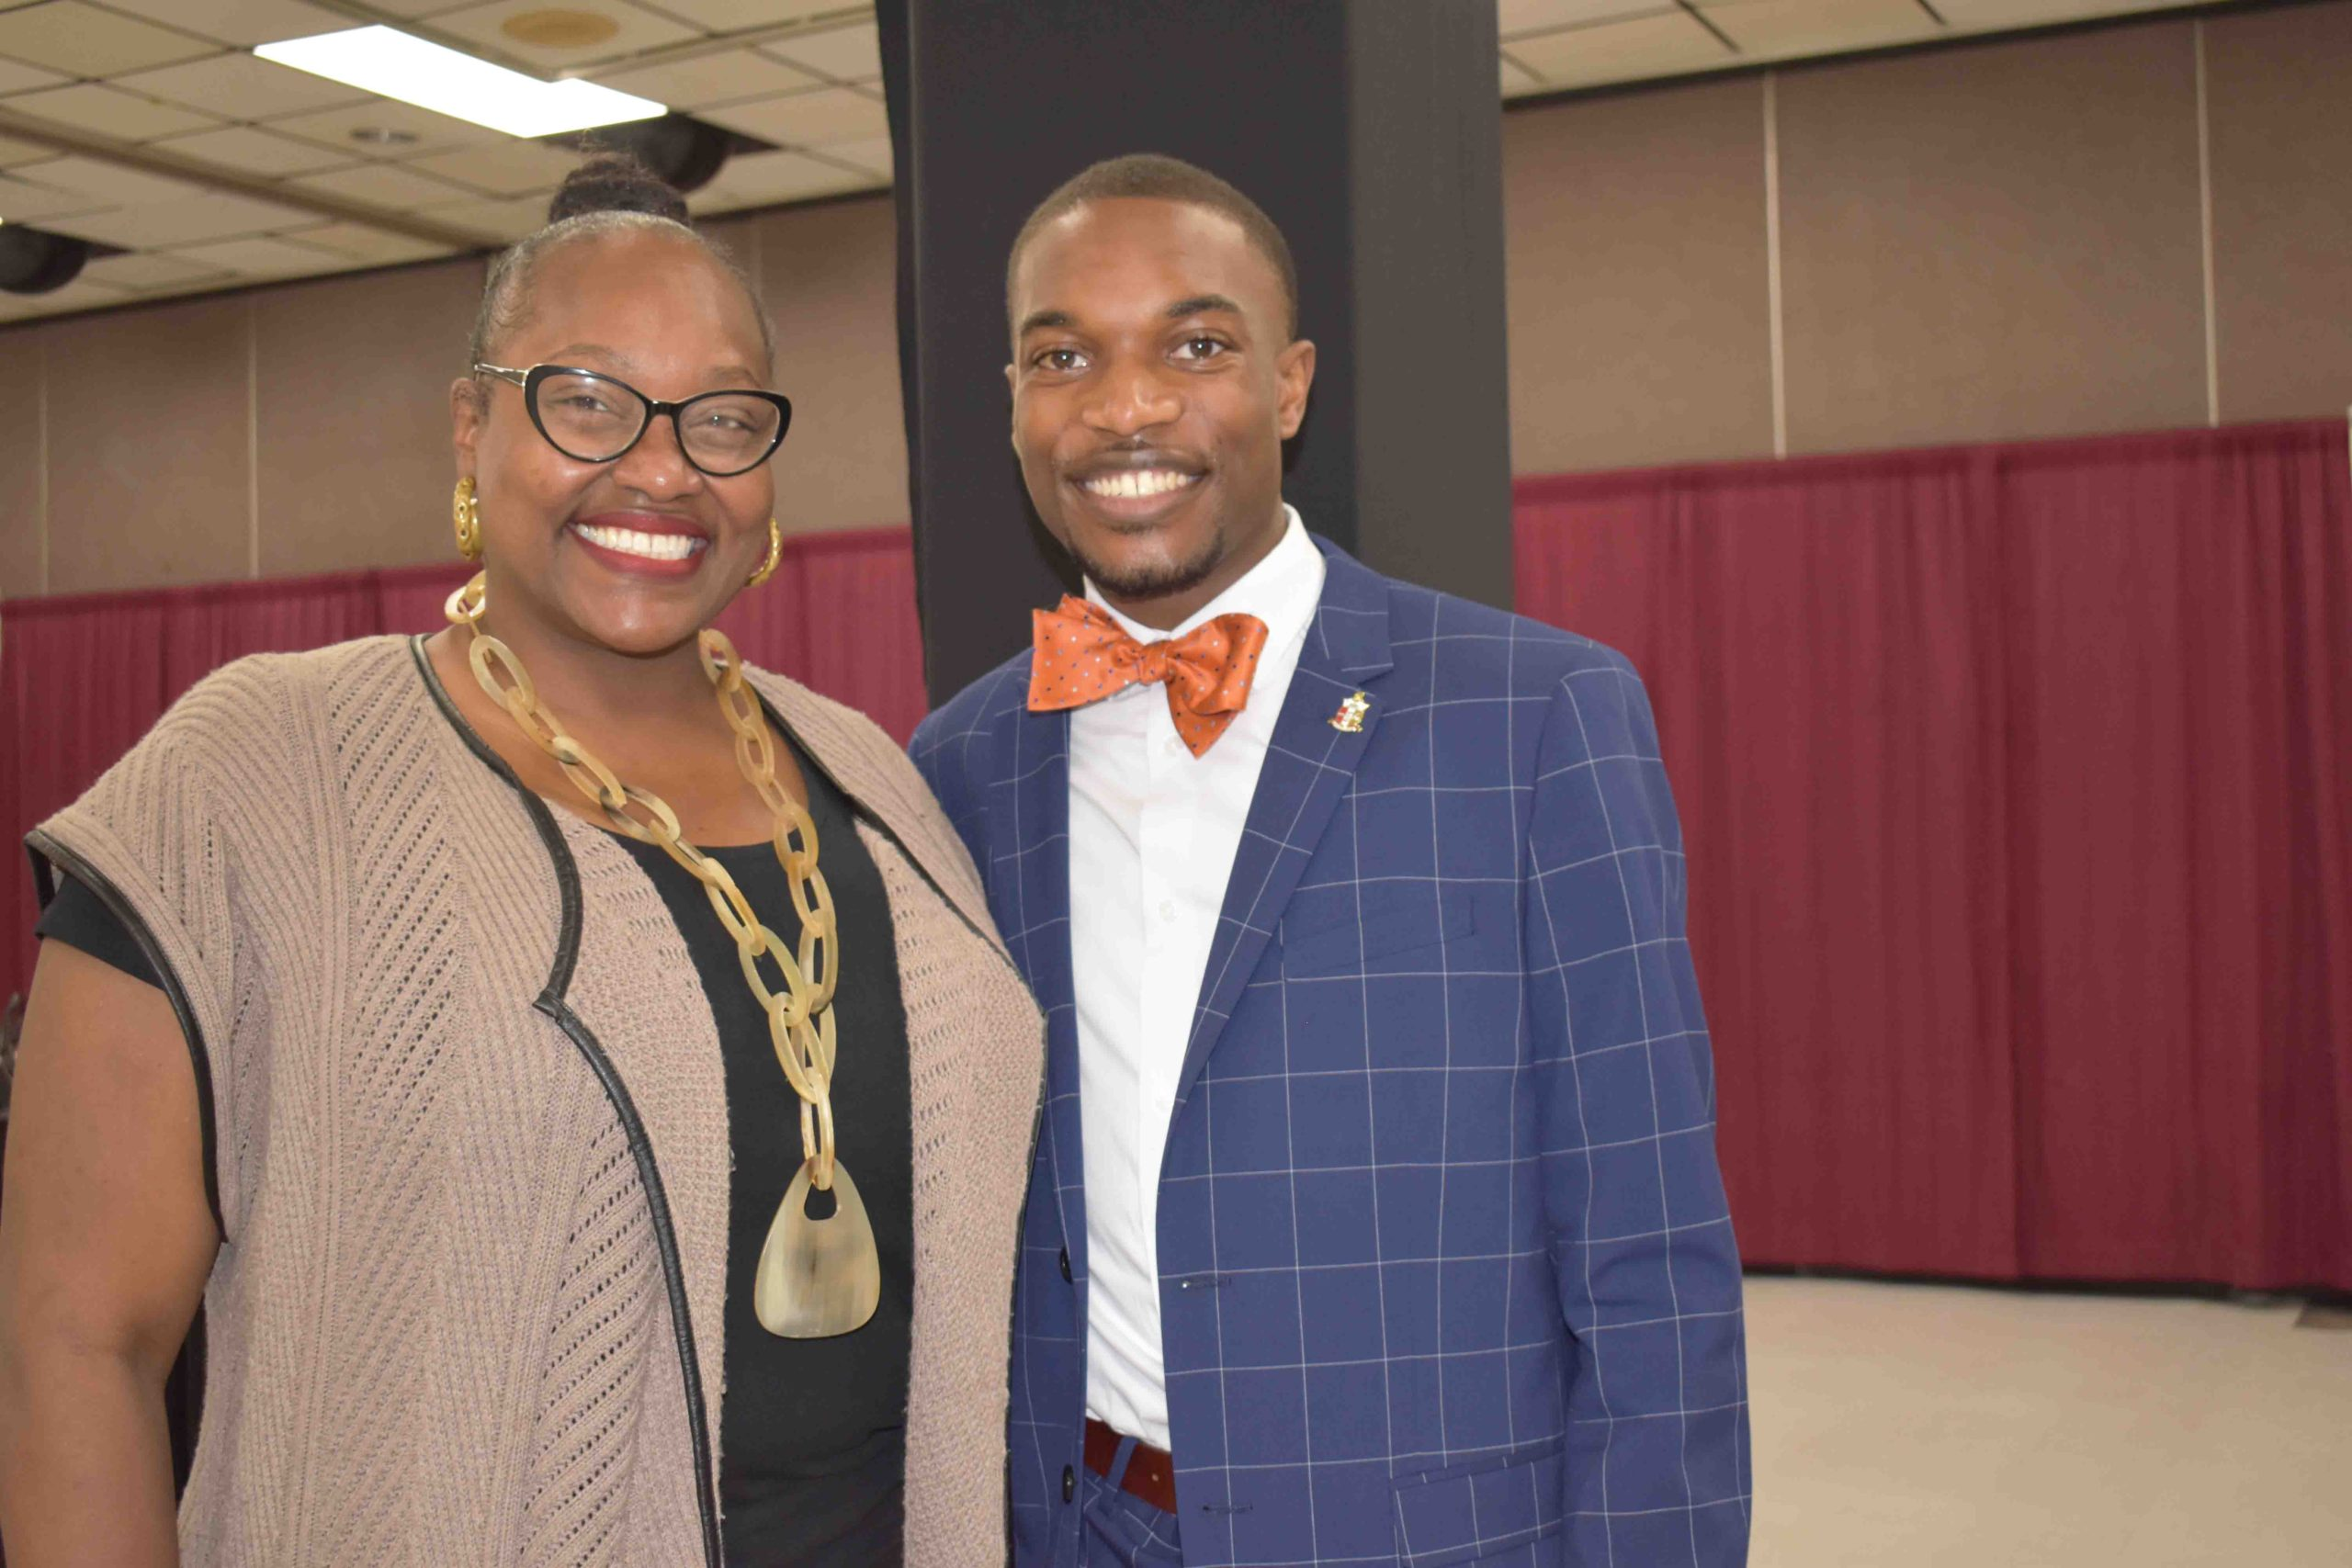 State Rep. Vivian Flower (Pine Bluff), UAPB Student Body President Leon Jones, III